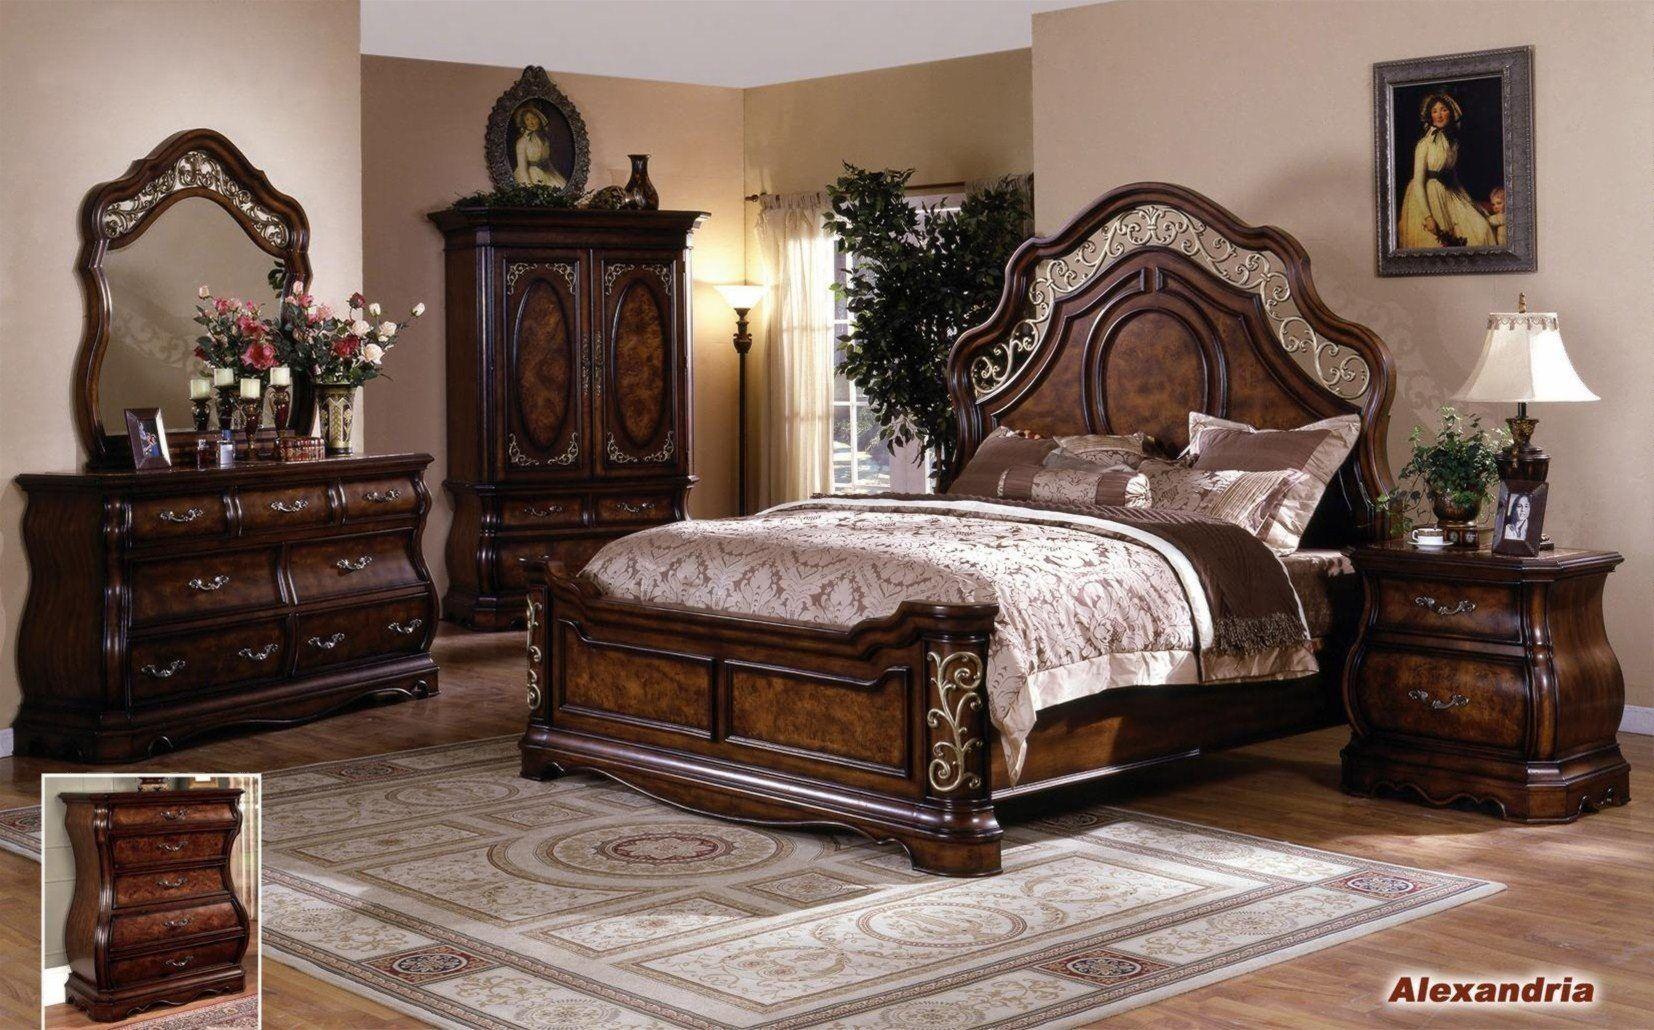 Alexandria Elegant Solid Wood Traditional Bedroom Set By